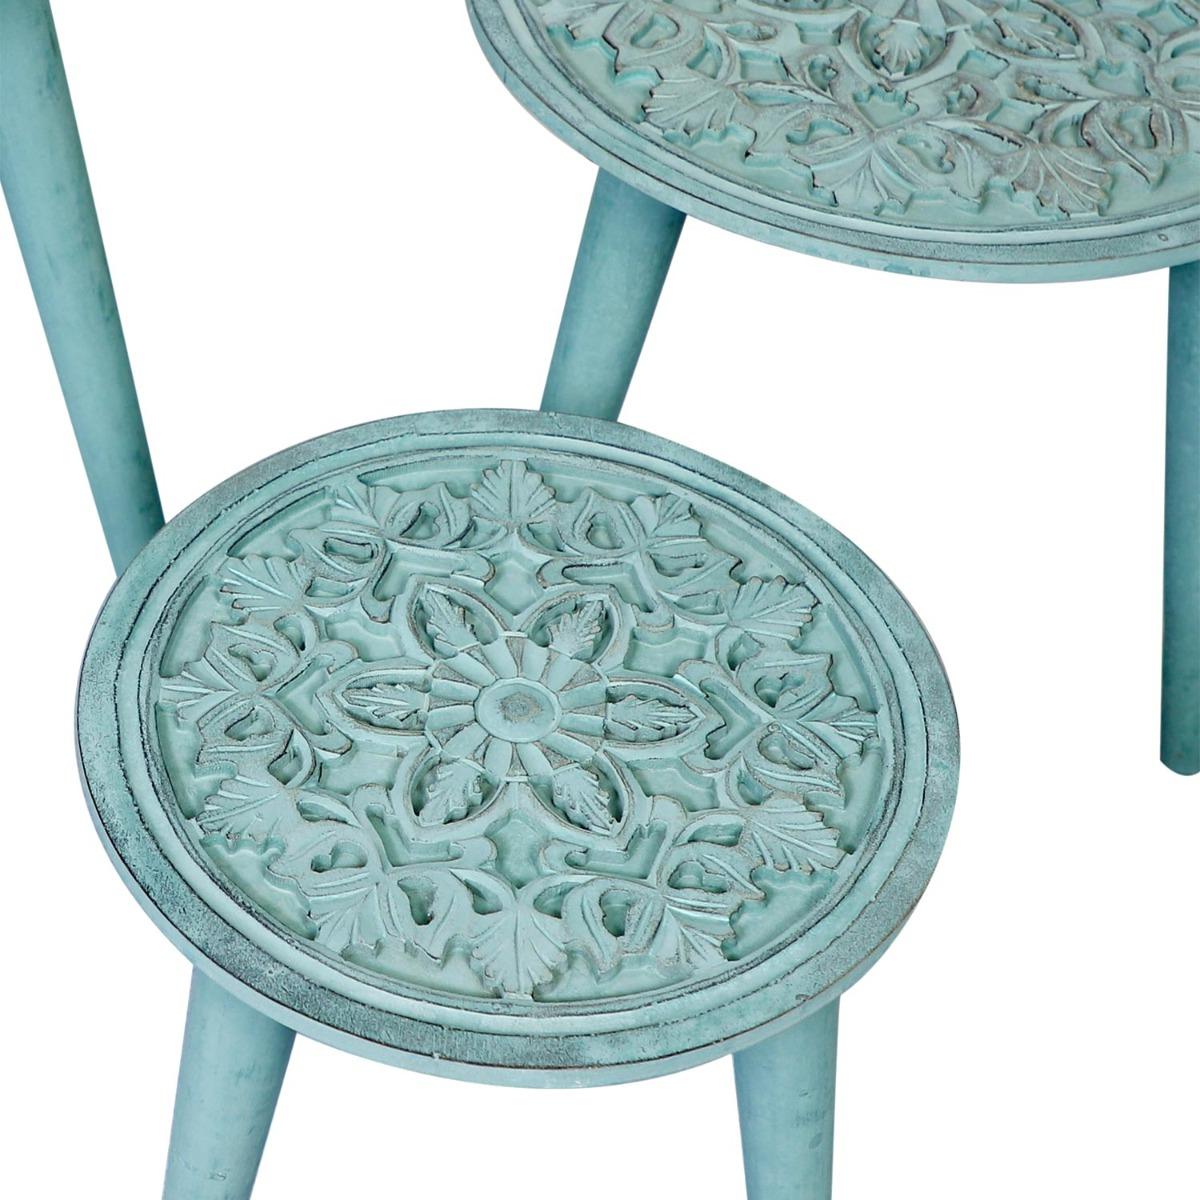 Set van 3 Kairouan blauwgroene bijzettafels